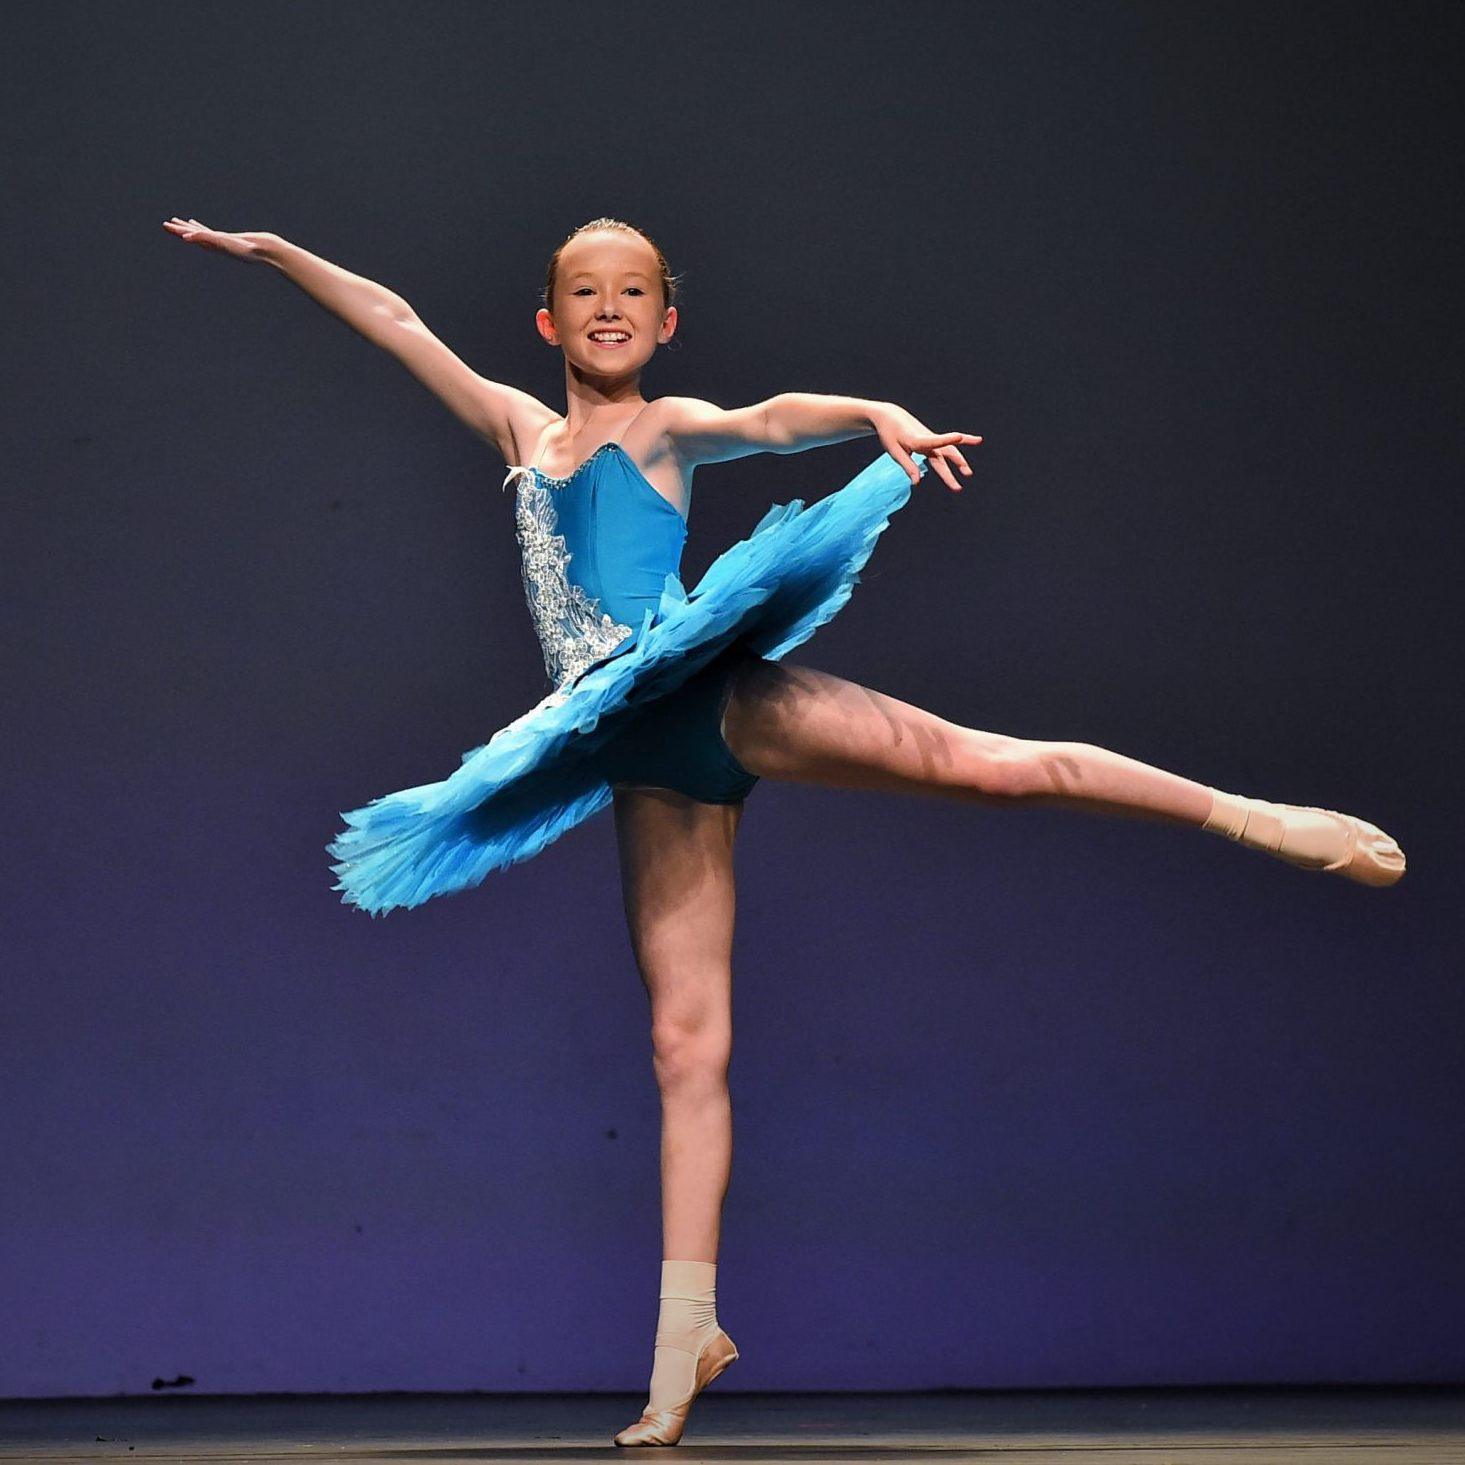 Competition team dancer